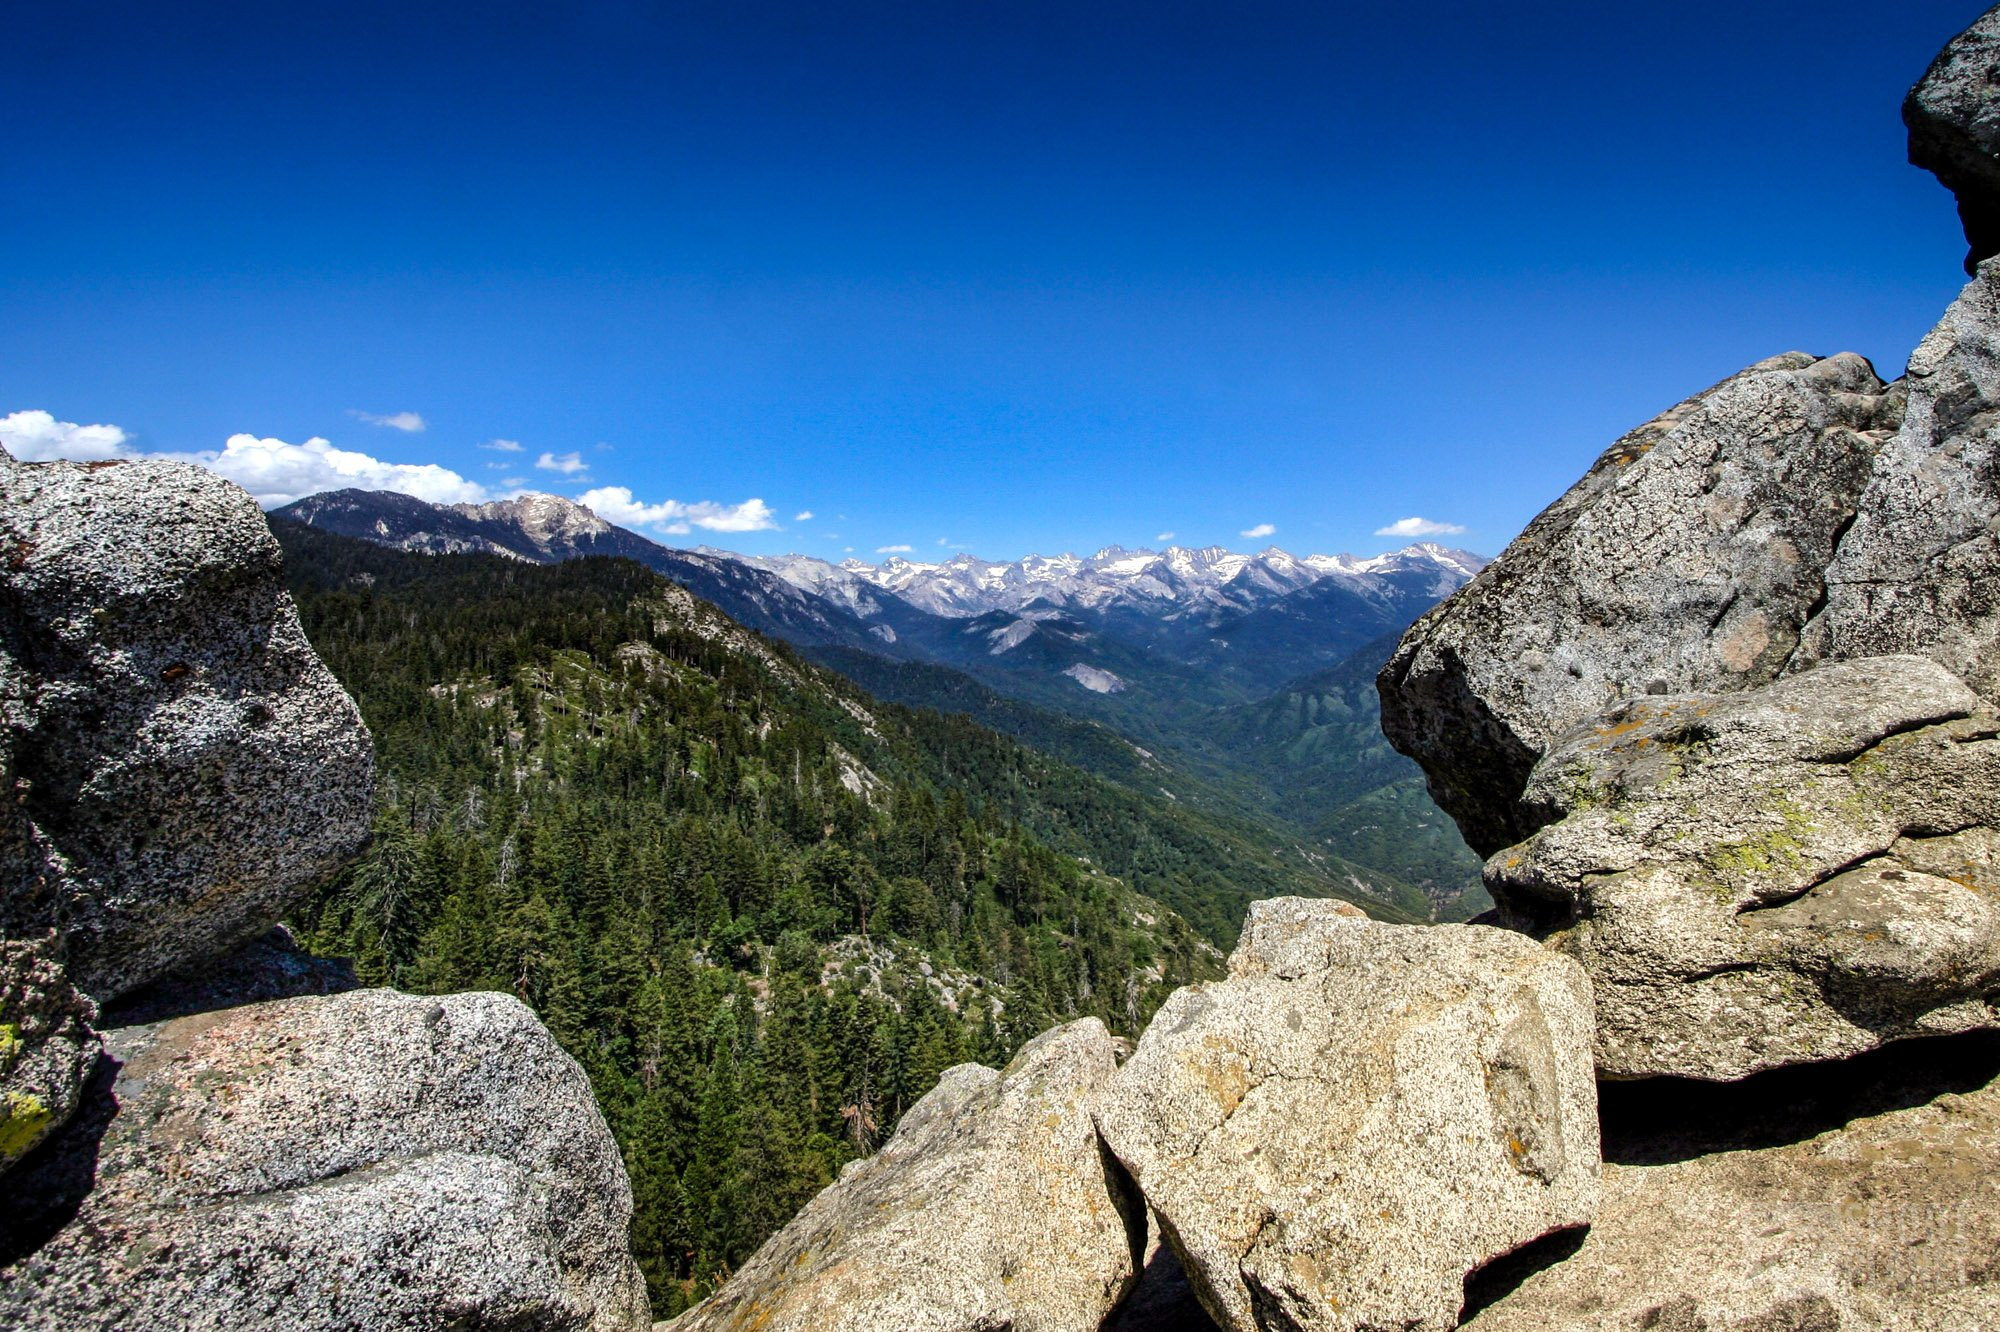 Sequoia National Park panorama, California USA